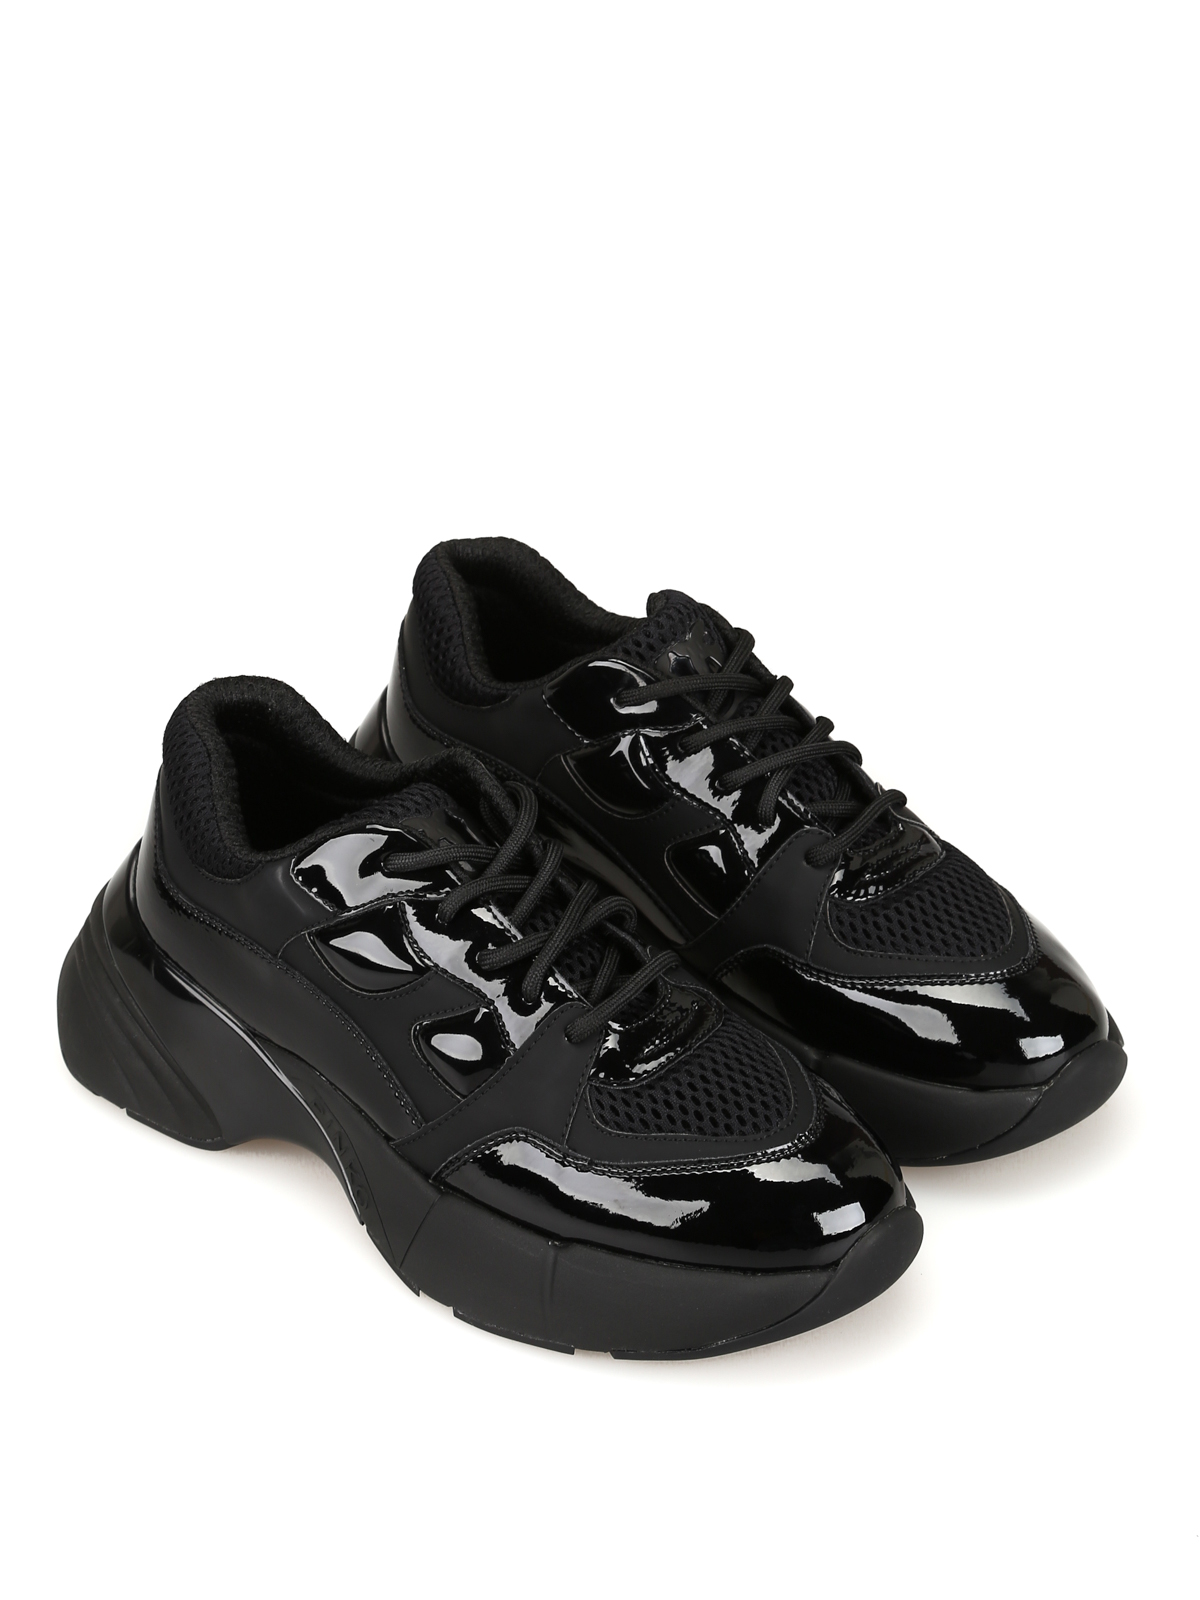 hot sale online 04c3f 02800 Pinko - Rubino black sneakers - trainers - 1H20LSY5BPZ99 ...